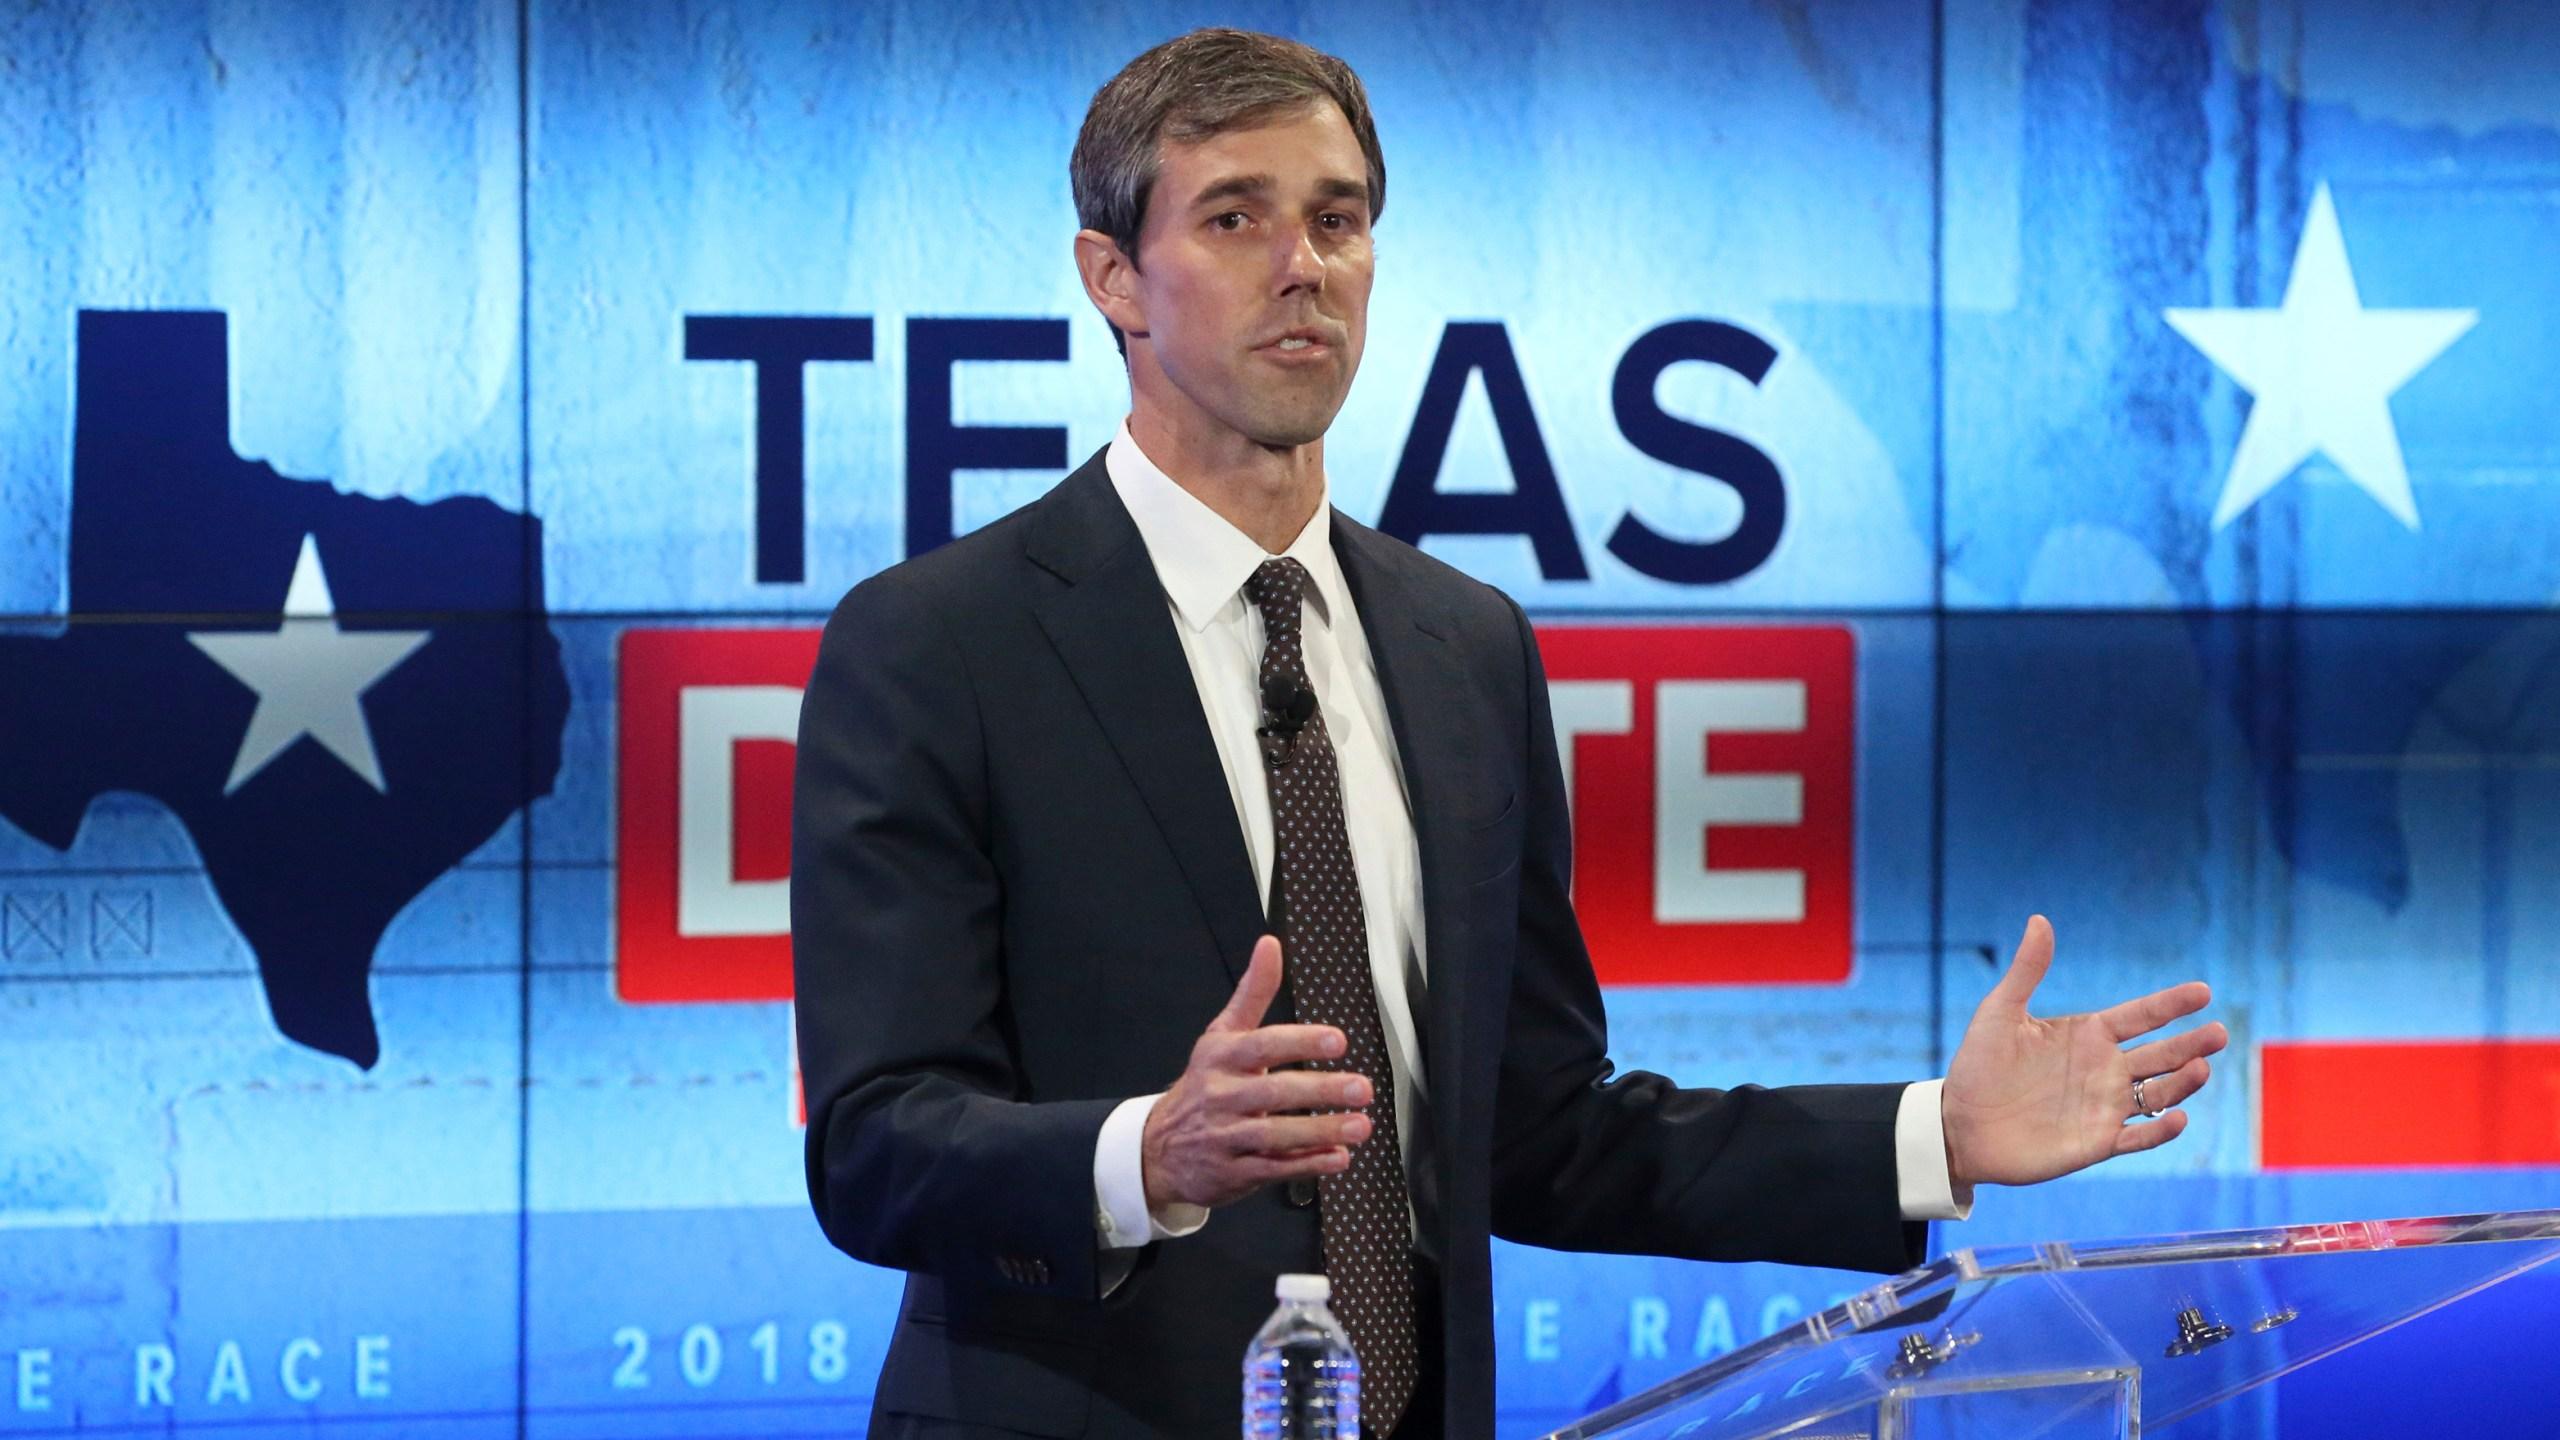 Election_2020_Beto_O'Rourke_99113-159532.jpg11529956